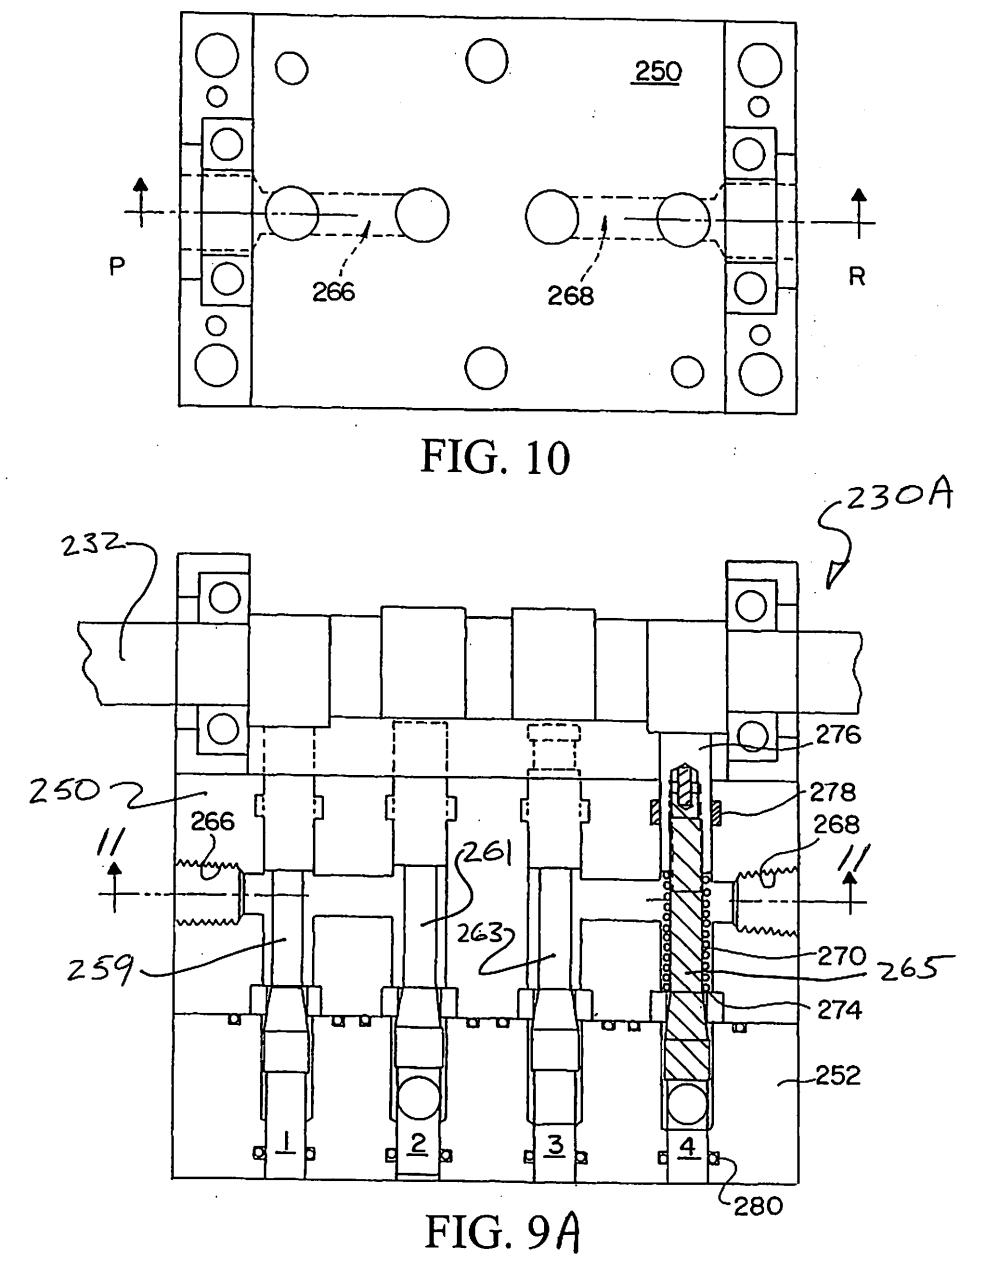 medium resolution of tomberlin crossfire 150r wiring diagram wiring source fairplay wiring diagram kandi go kart engine diagram besides